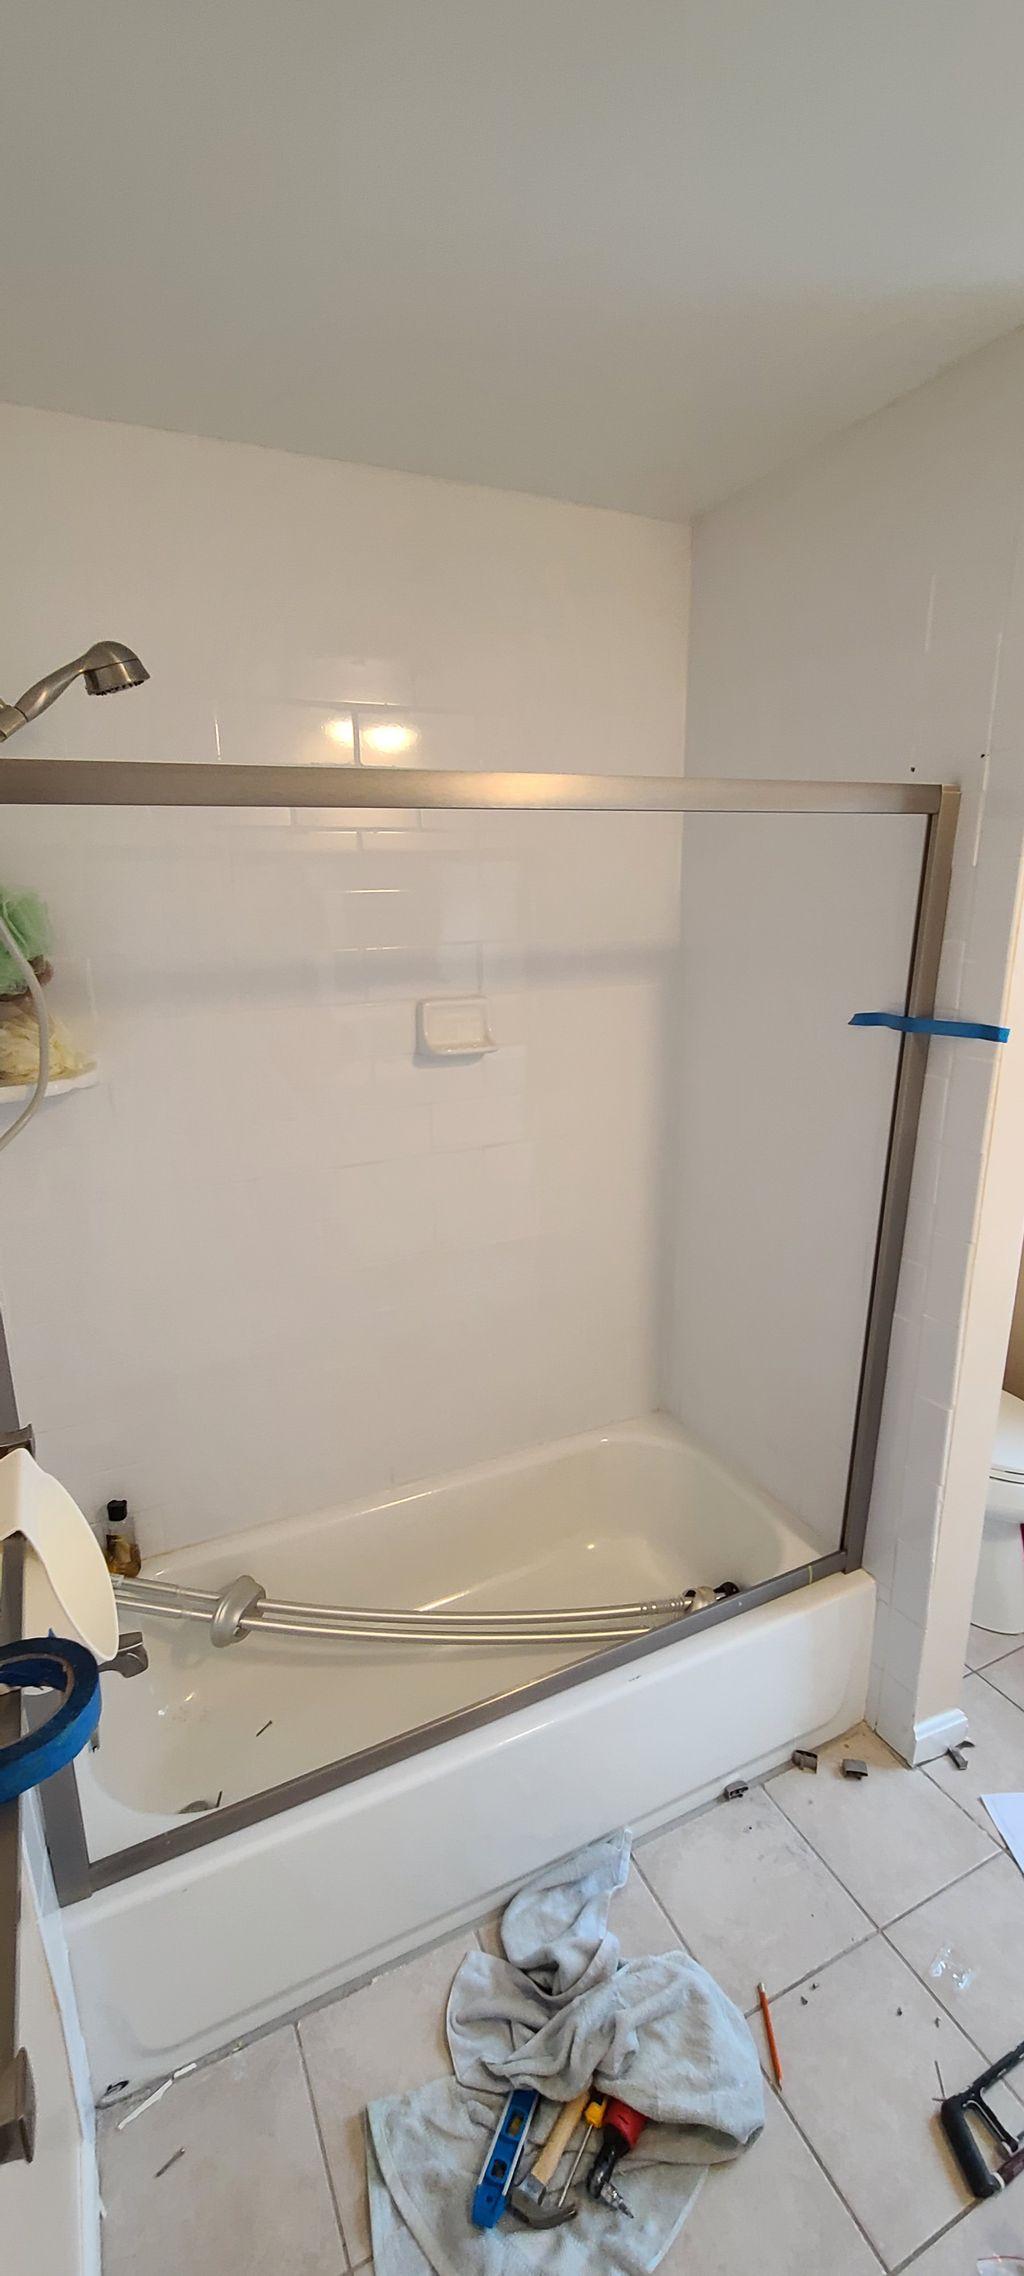 Bathtub door installation